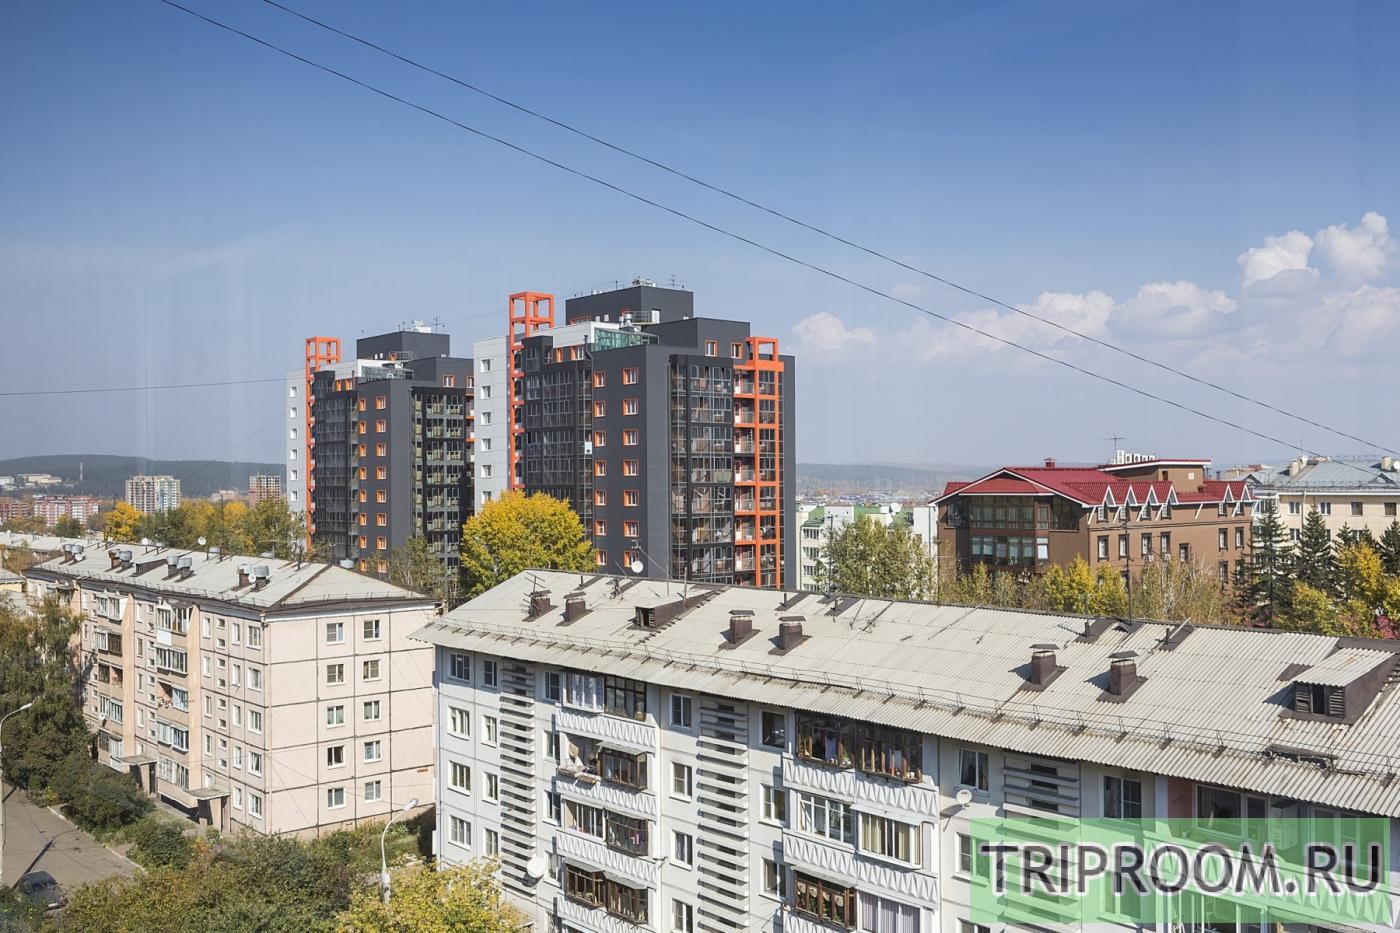 1-комнатная квартира посуточно (вариант № 35709), ул. Ядринцева улица, фото № 8